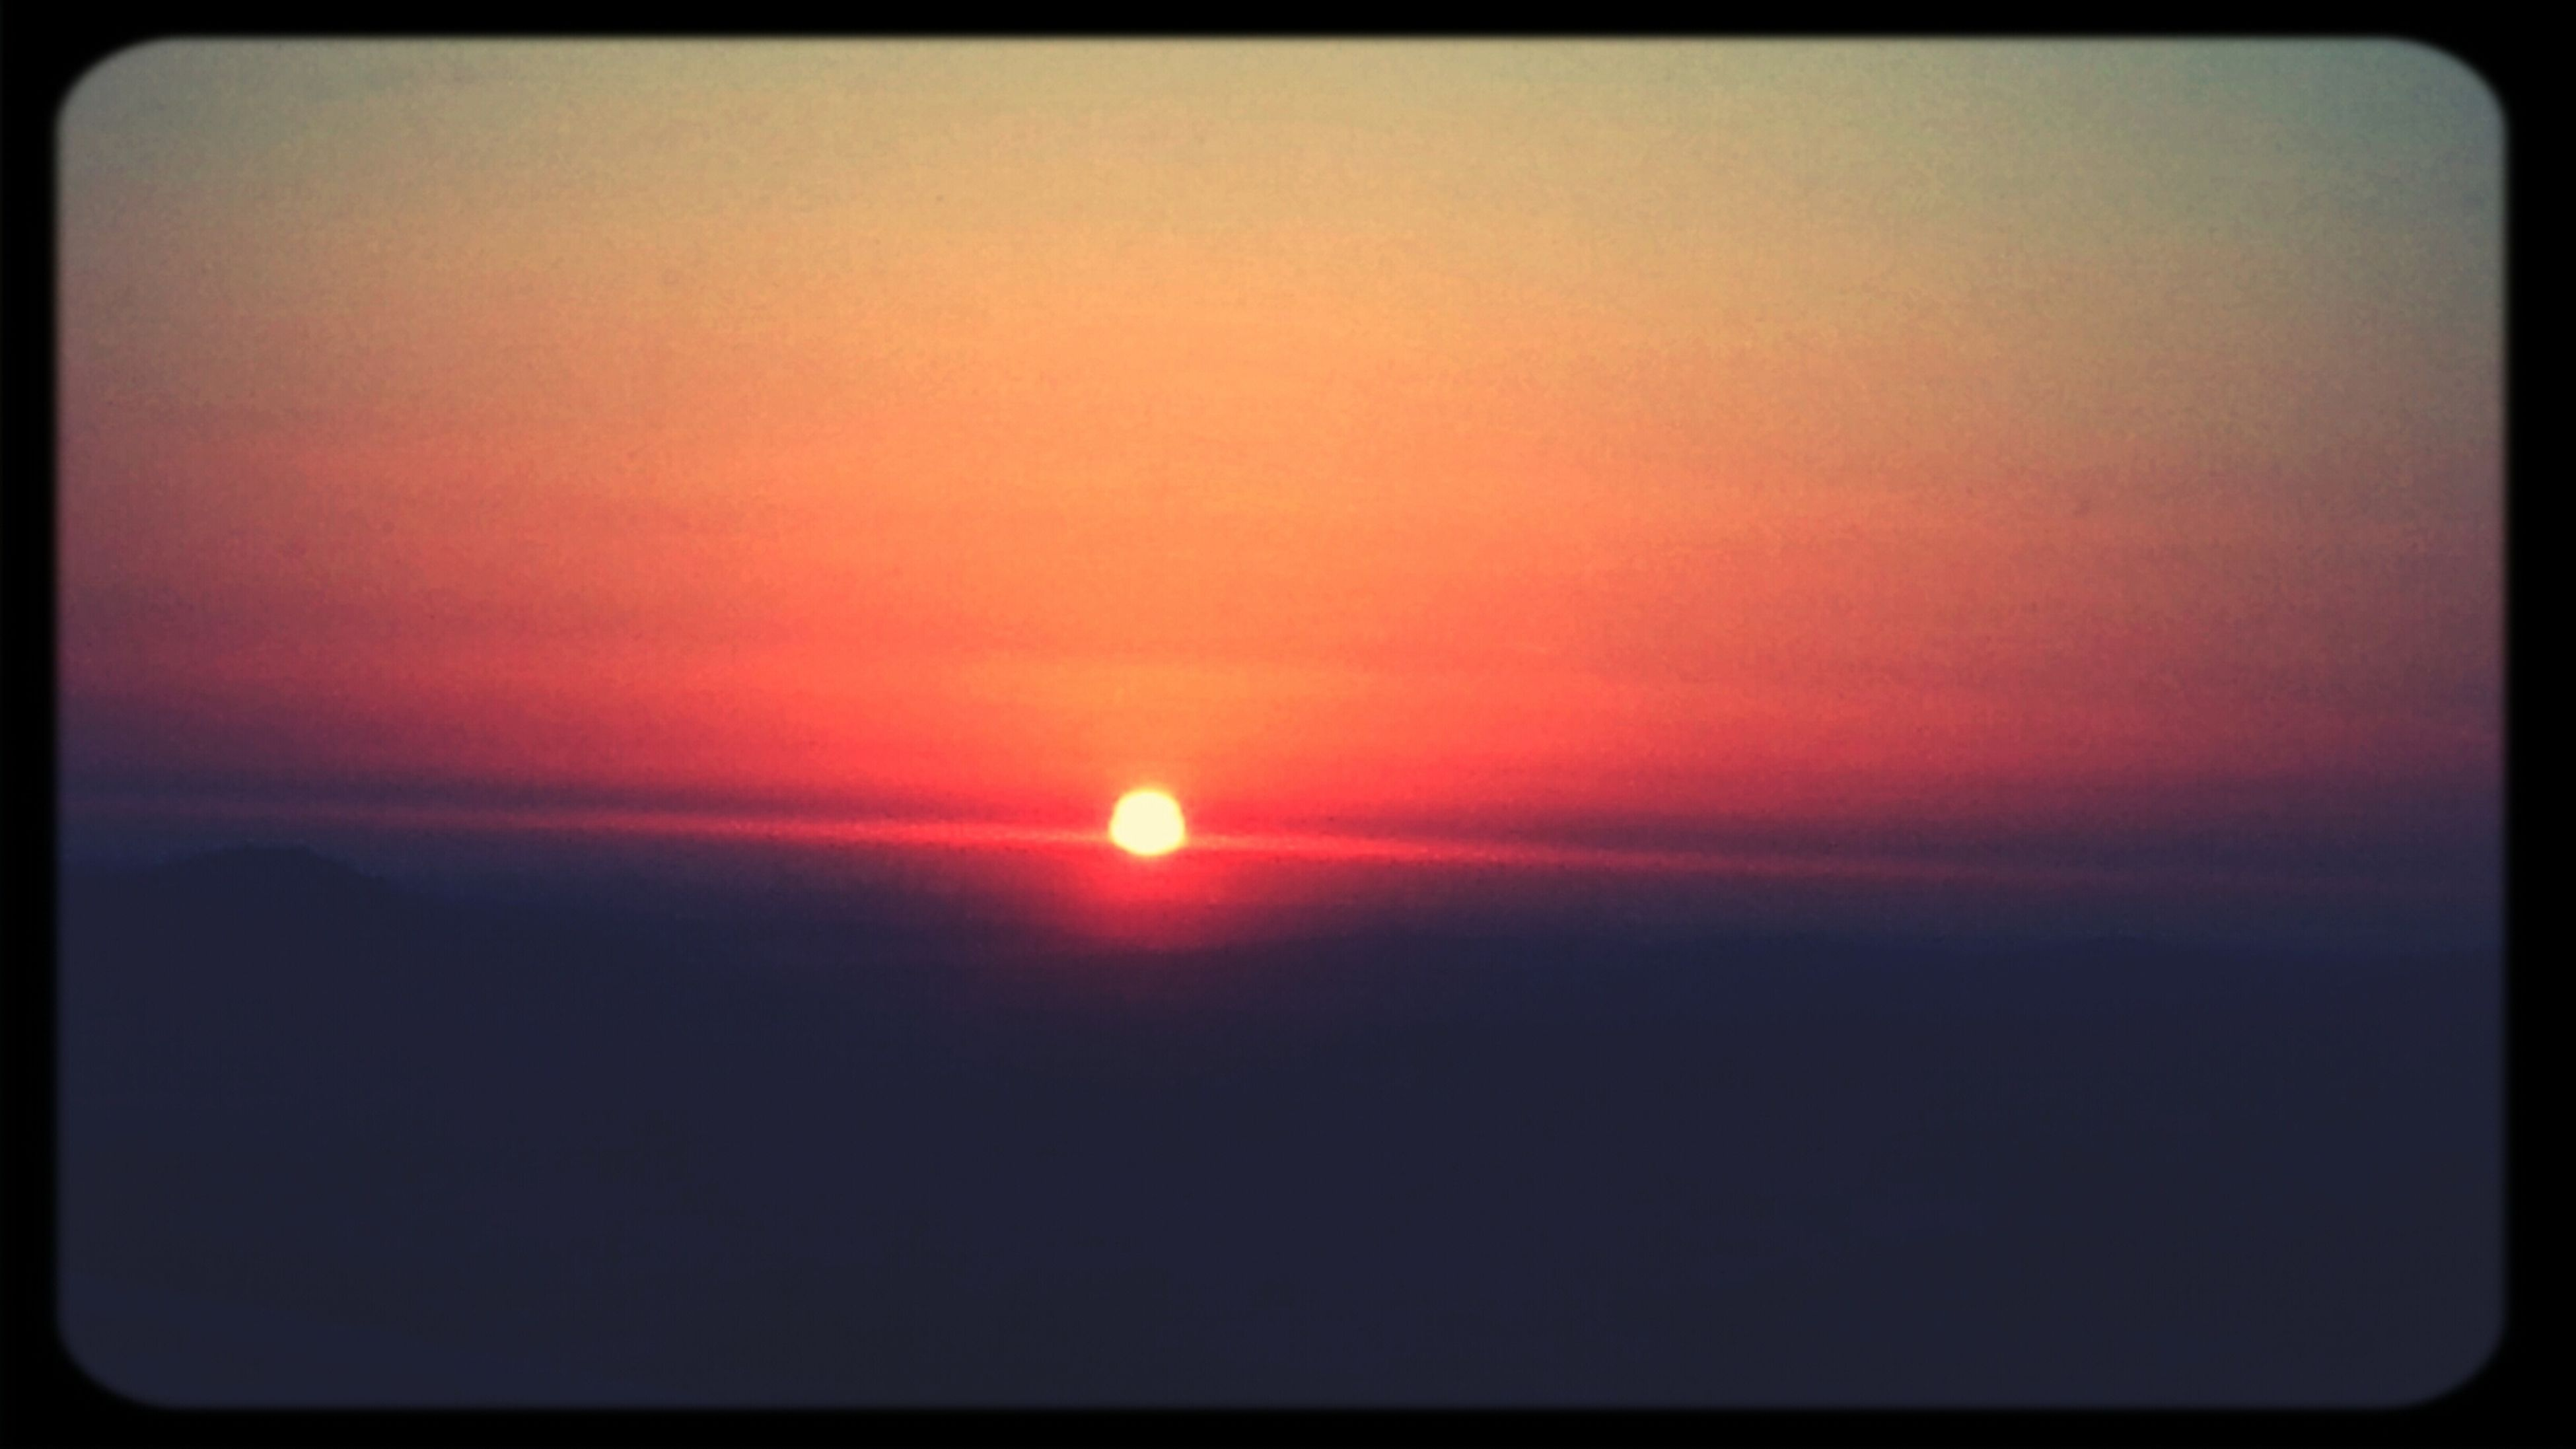 sunset, transfer print, sun, scenics, tranquil scene, beauty in nature, orange color, tranquility, auto post production filter, idyllic, sky, nature, silhouette, copy space, sunlight, outdoors, landscape, no people, majestic, cloud - sky